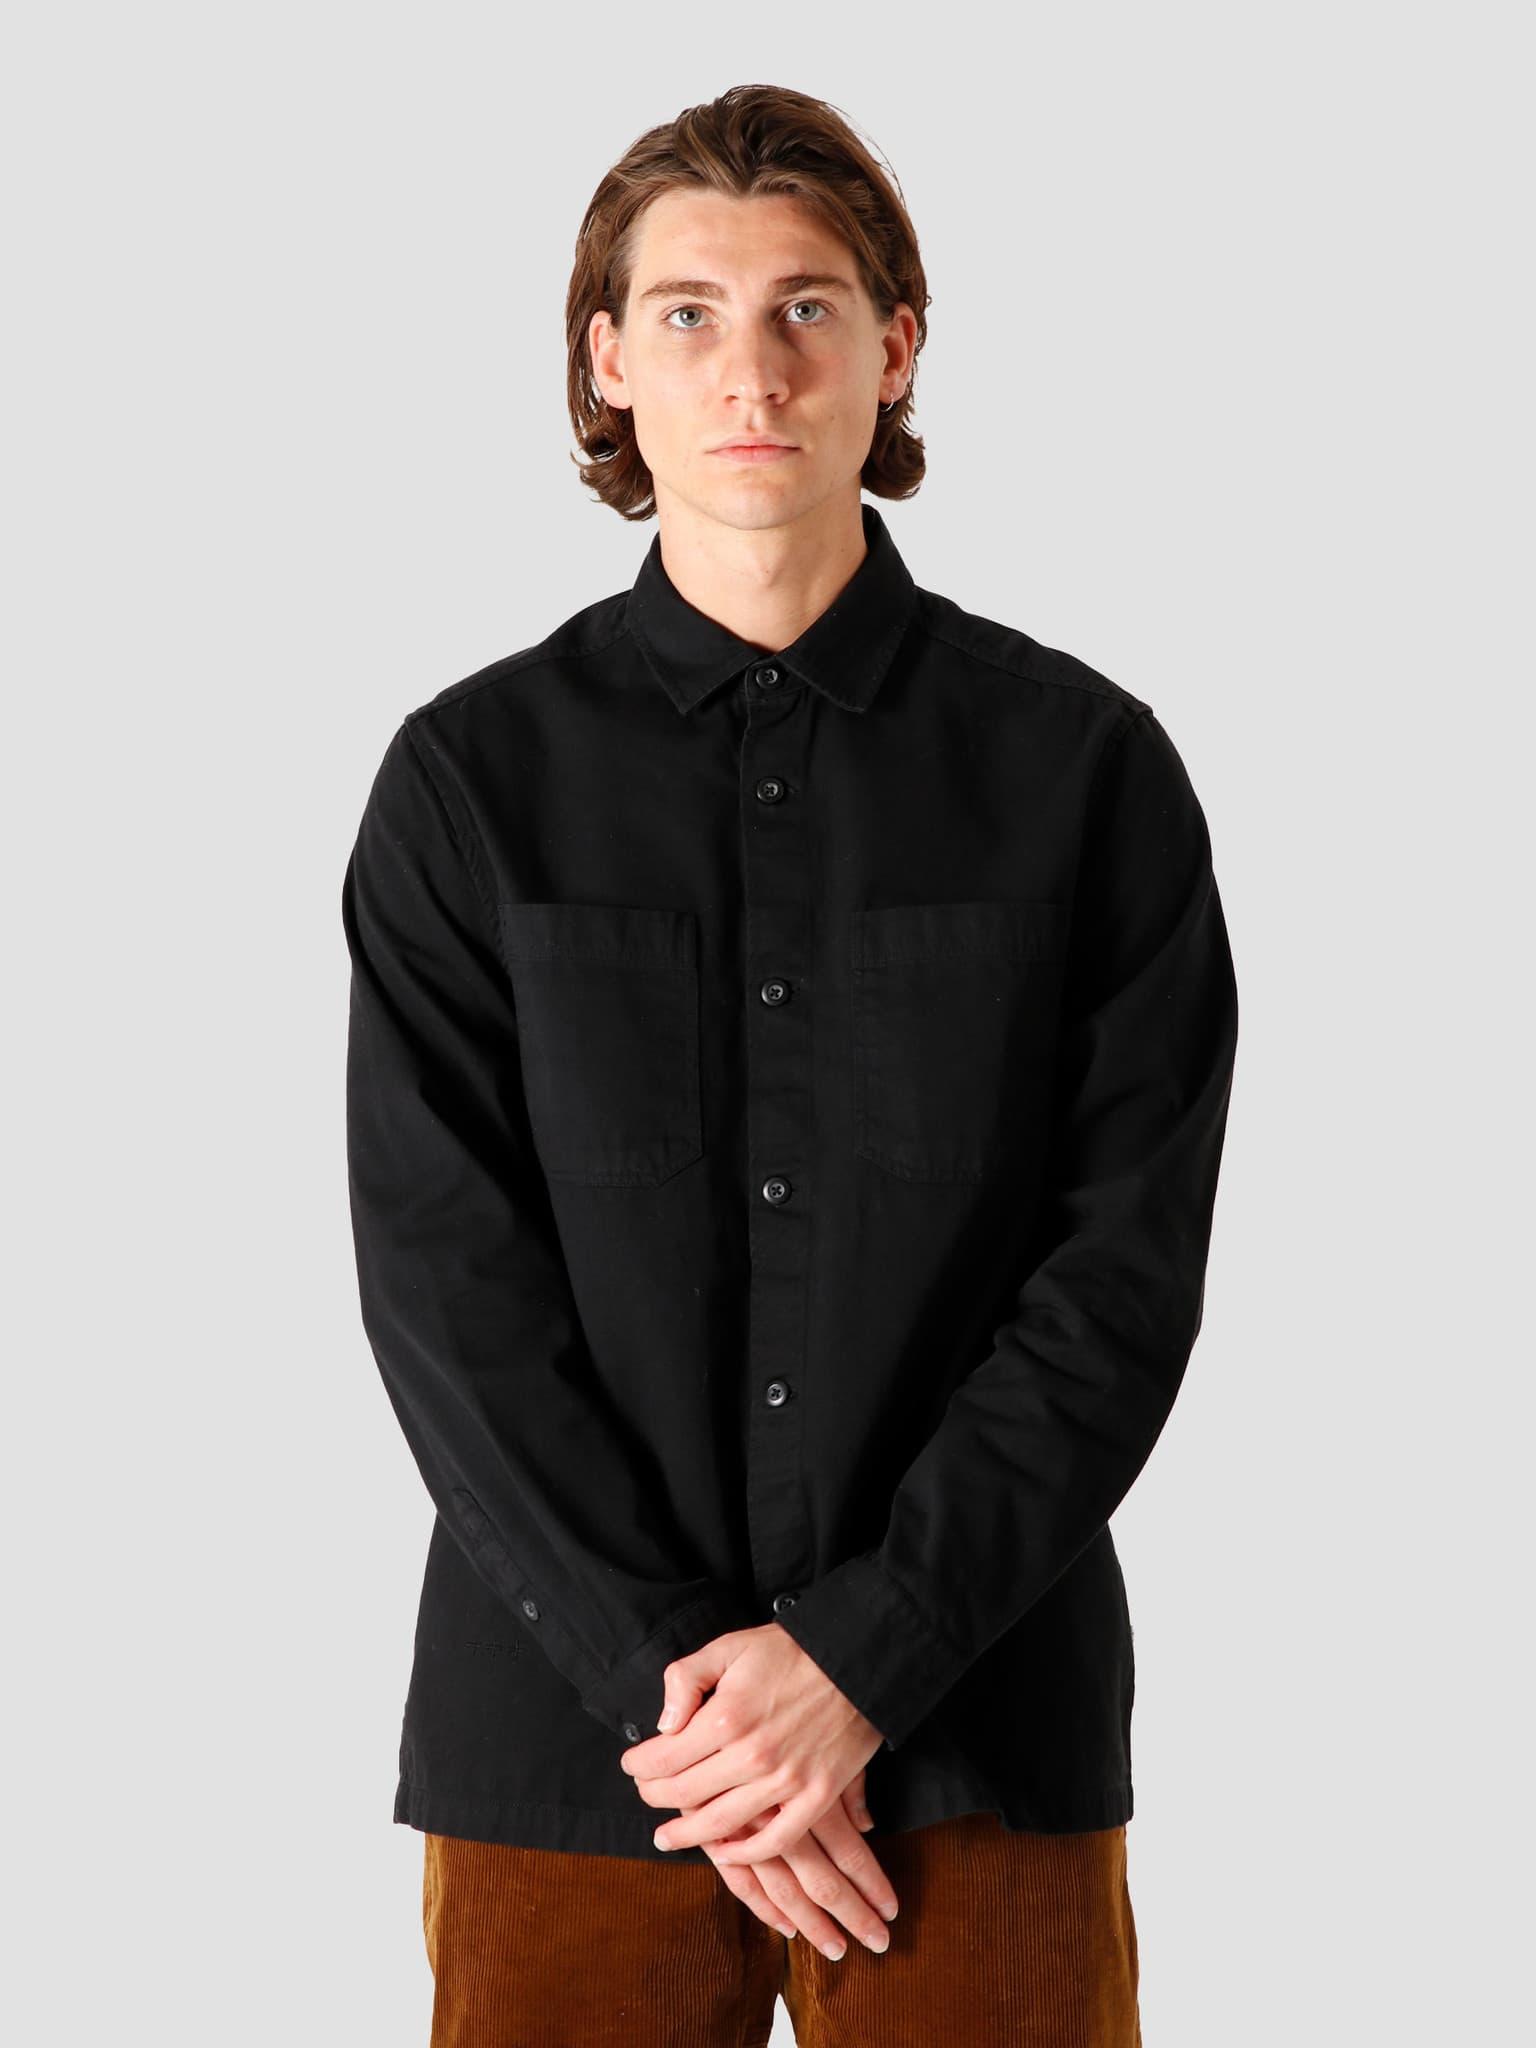 QB42 Overshirt Black